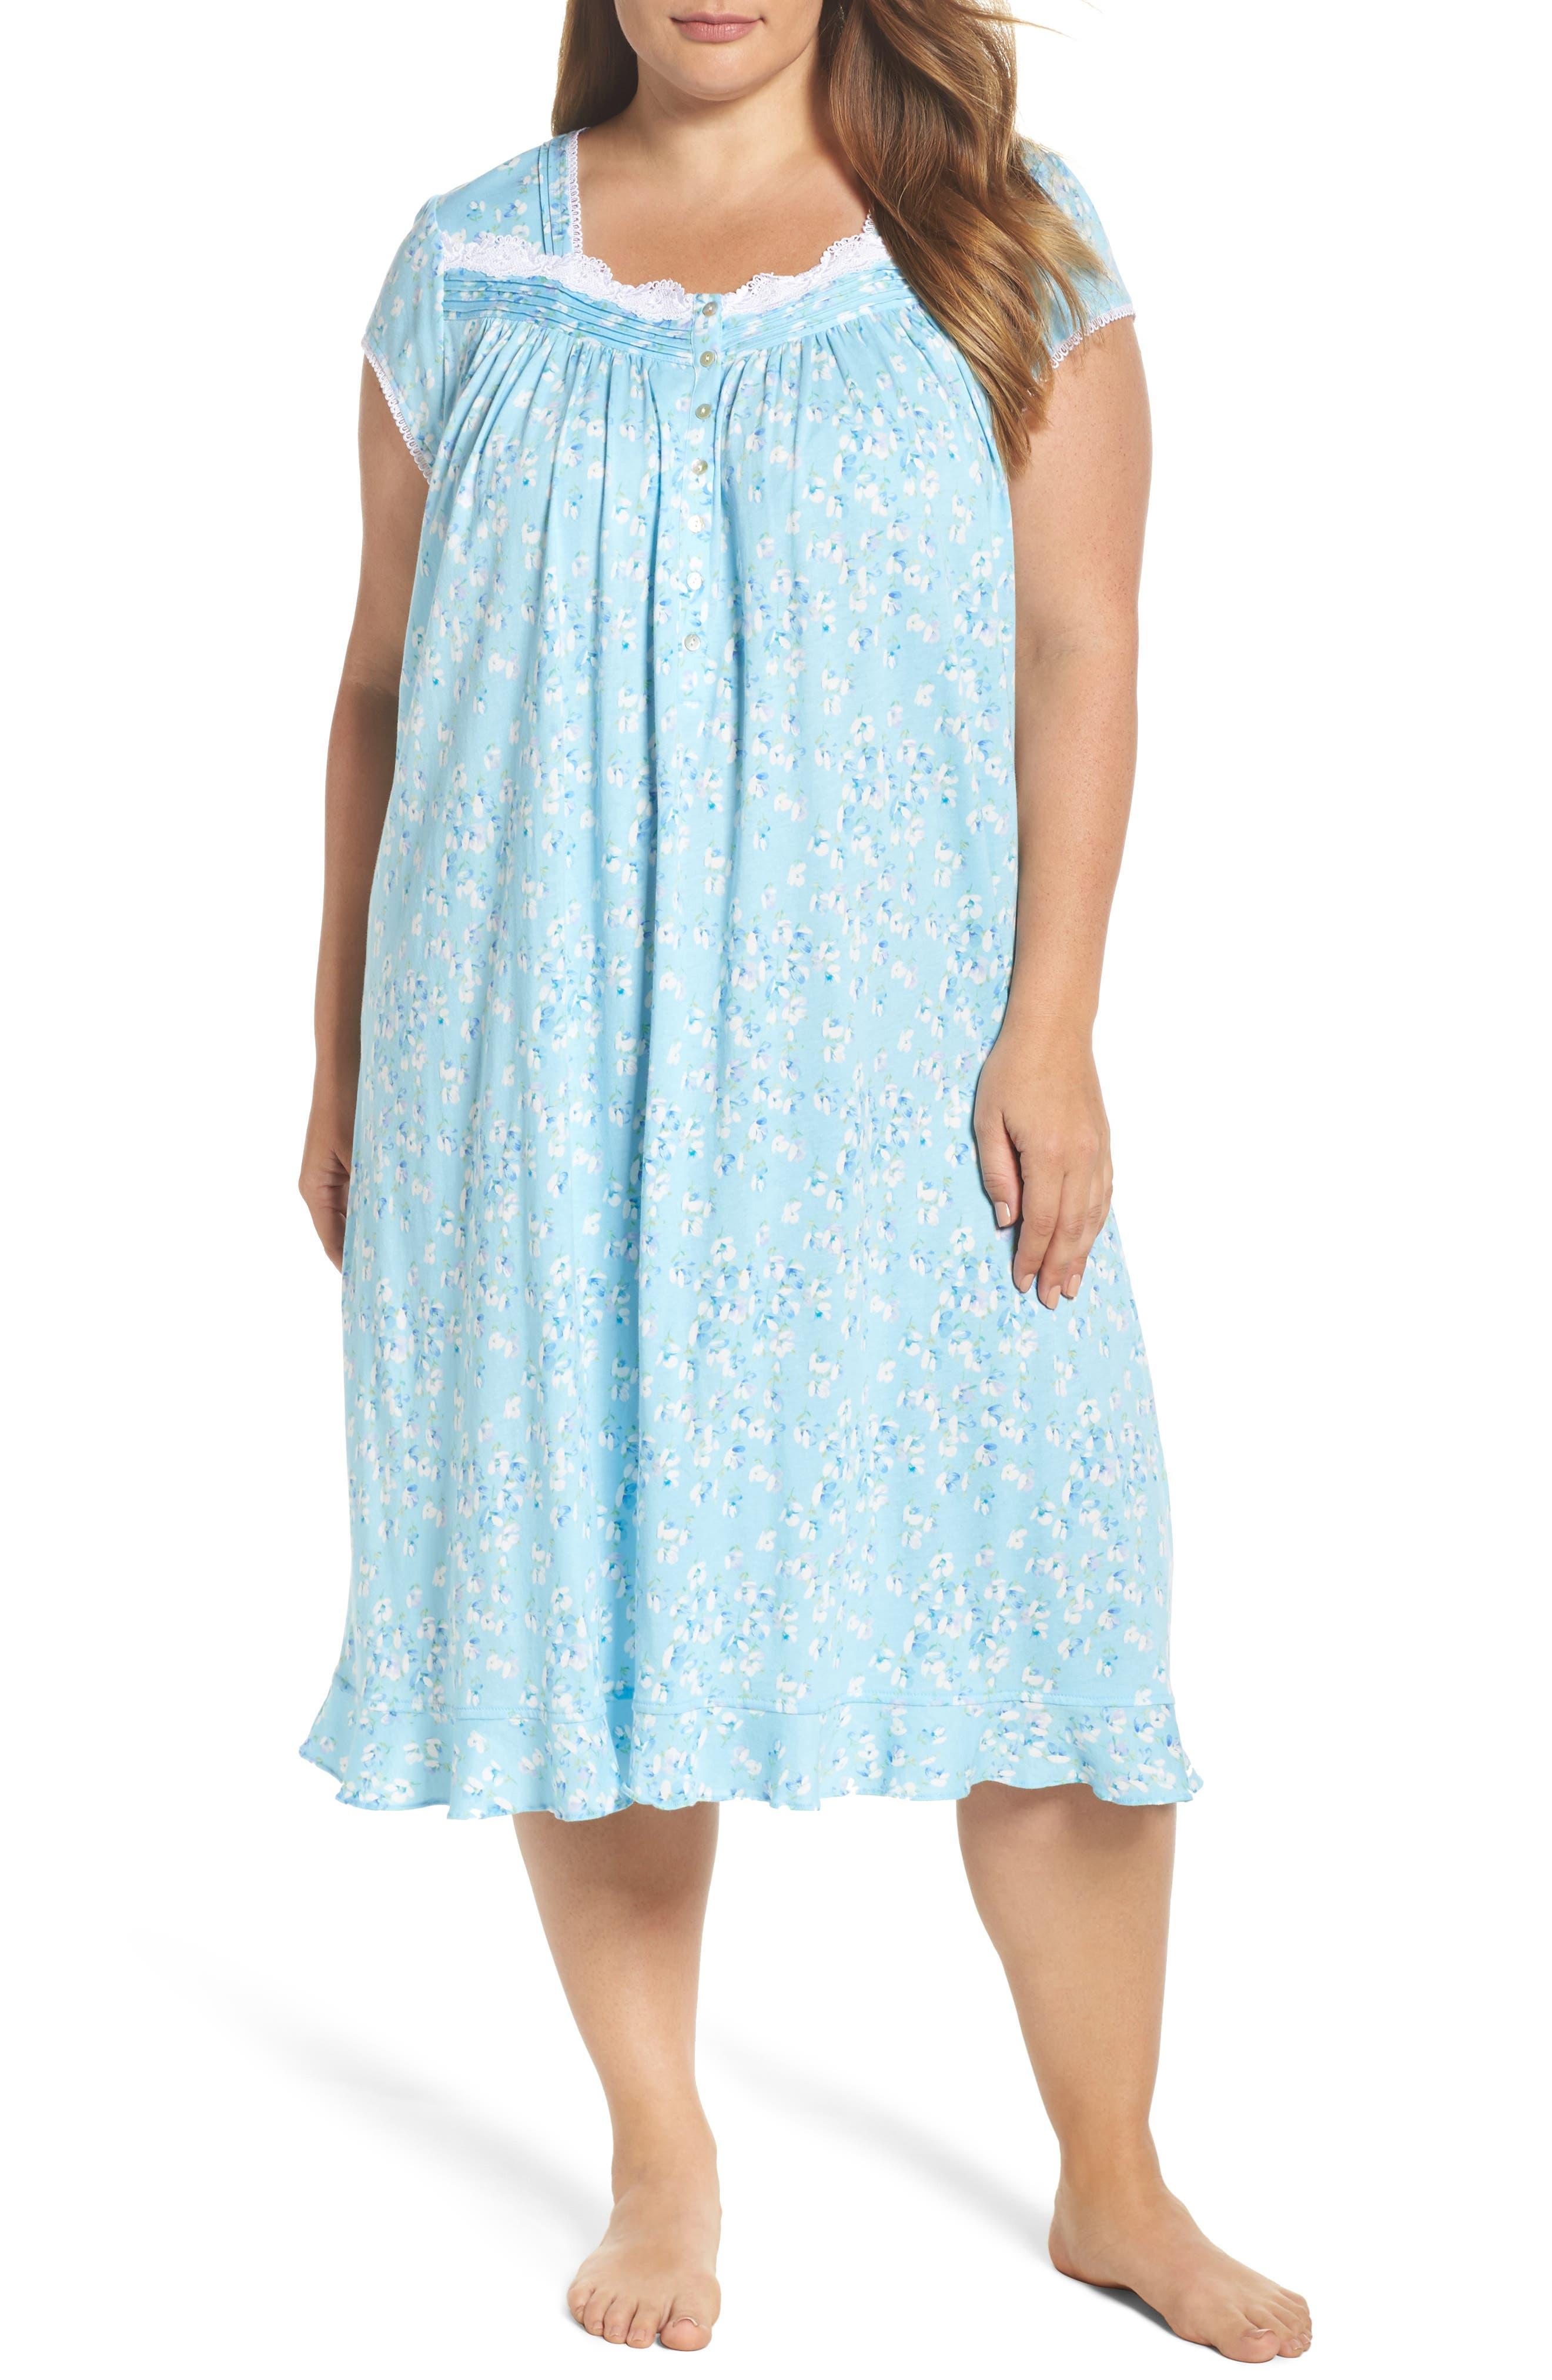 Waltz Nightgown,                         Main,                         color, Light Sea Glass/ Multi Floral